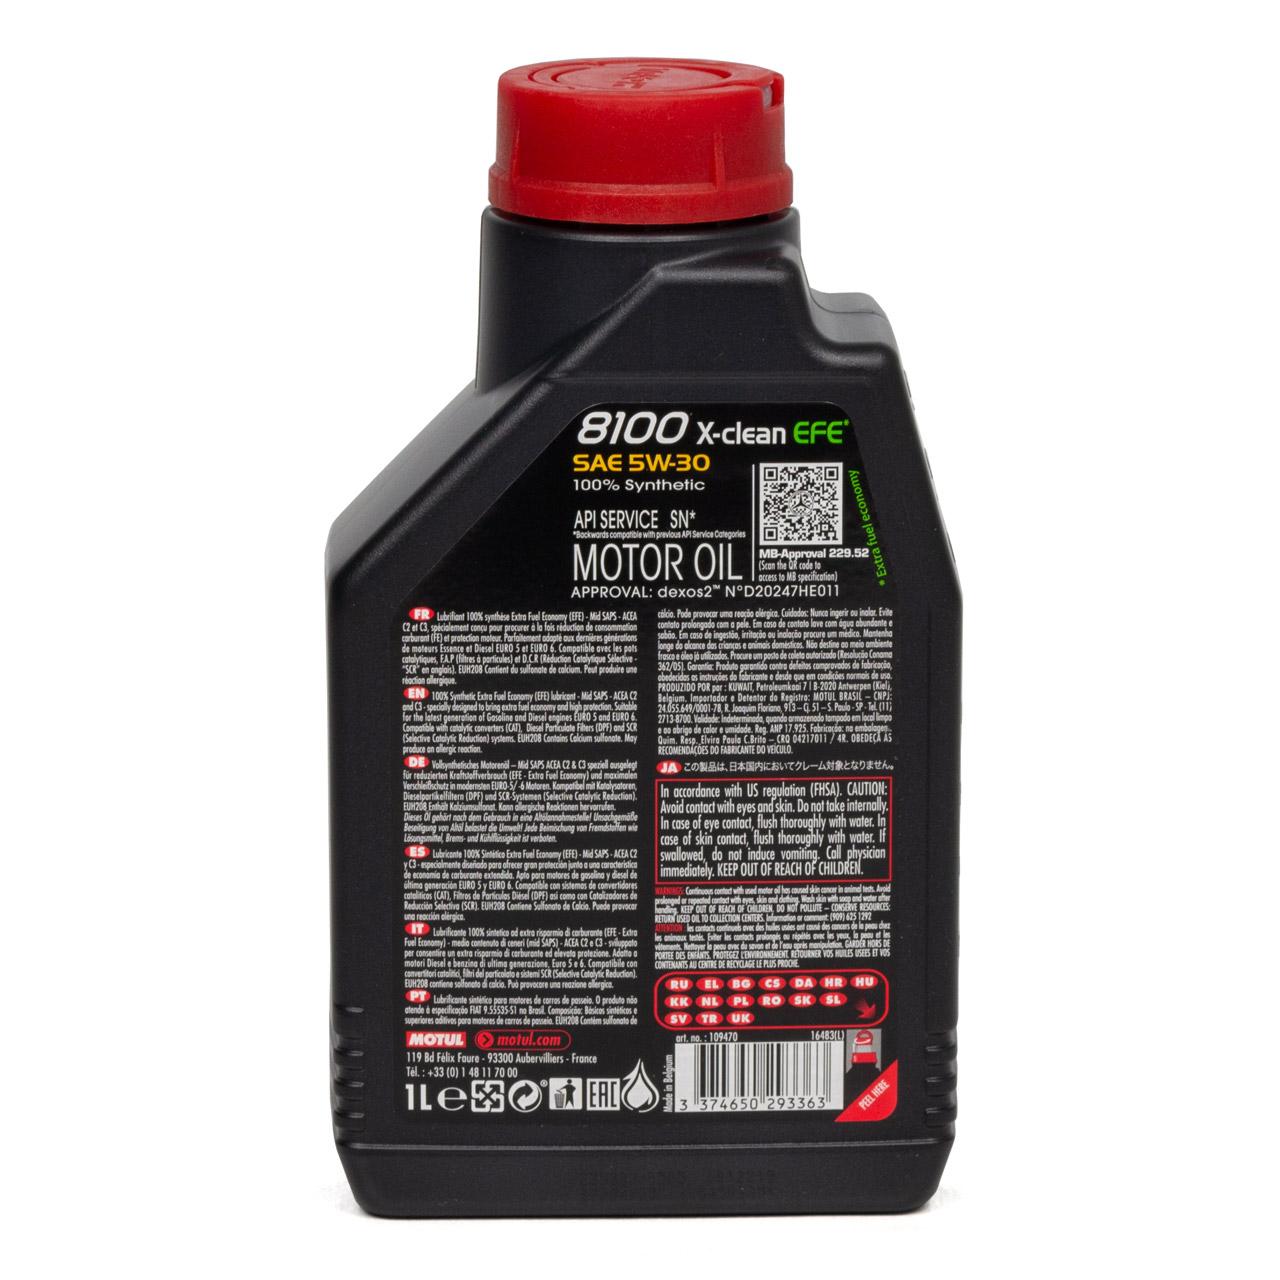 MOTUL 8100 X-Clean EFE Motoröl Öl 5W30 dexos2 VW 505.00/505.01 - 1L 1 Liter